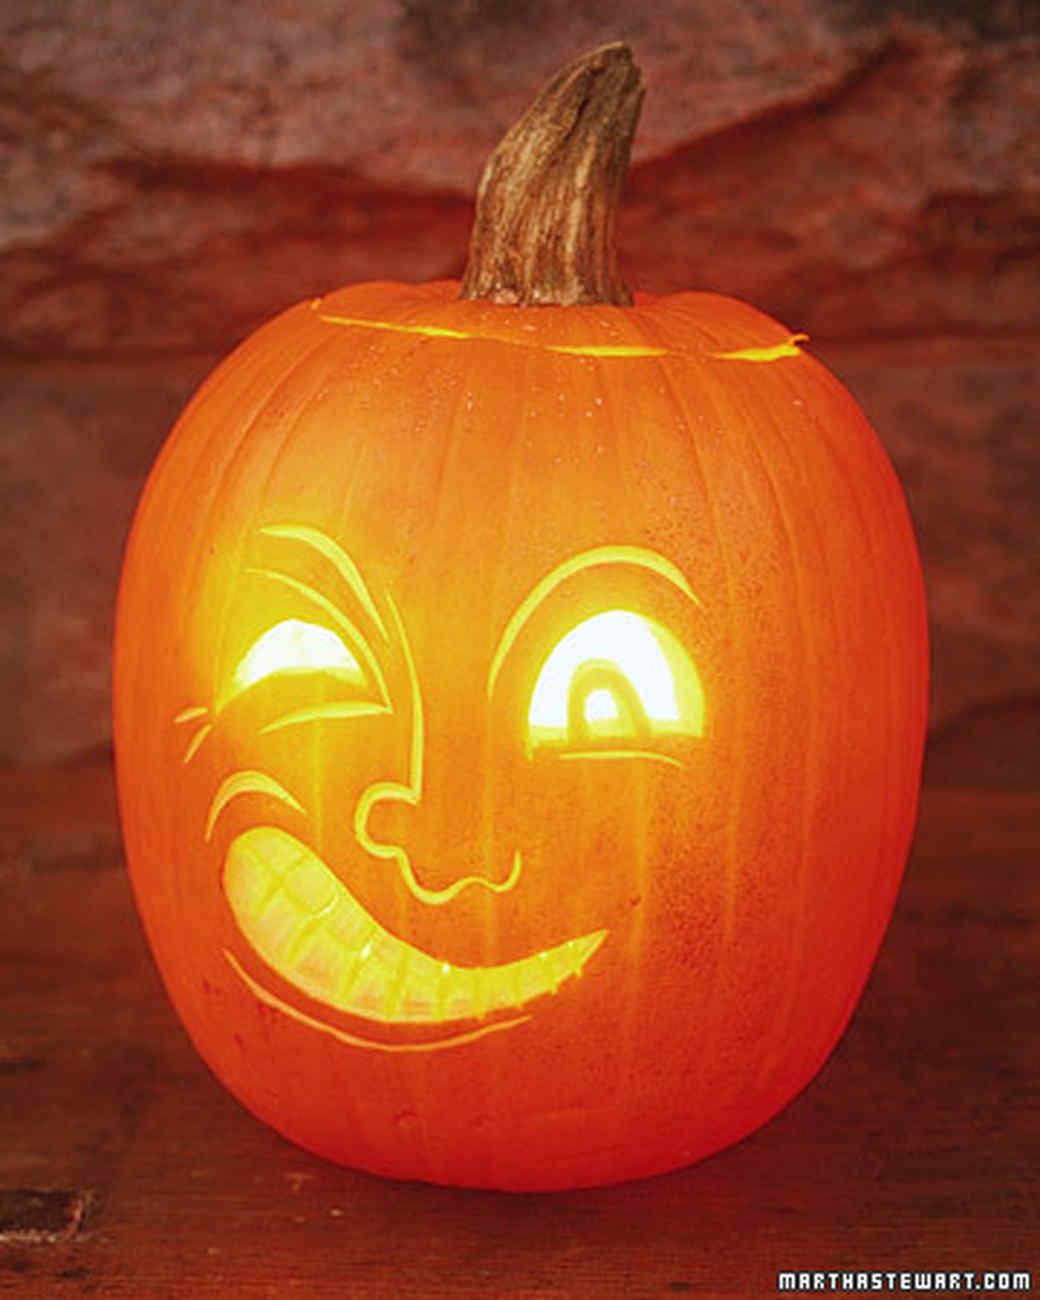 Jack the Winker: How to Light a Pumpkin